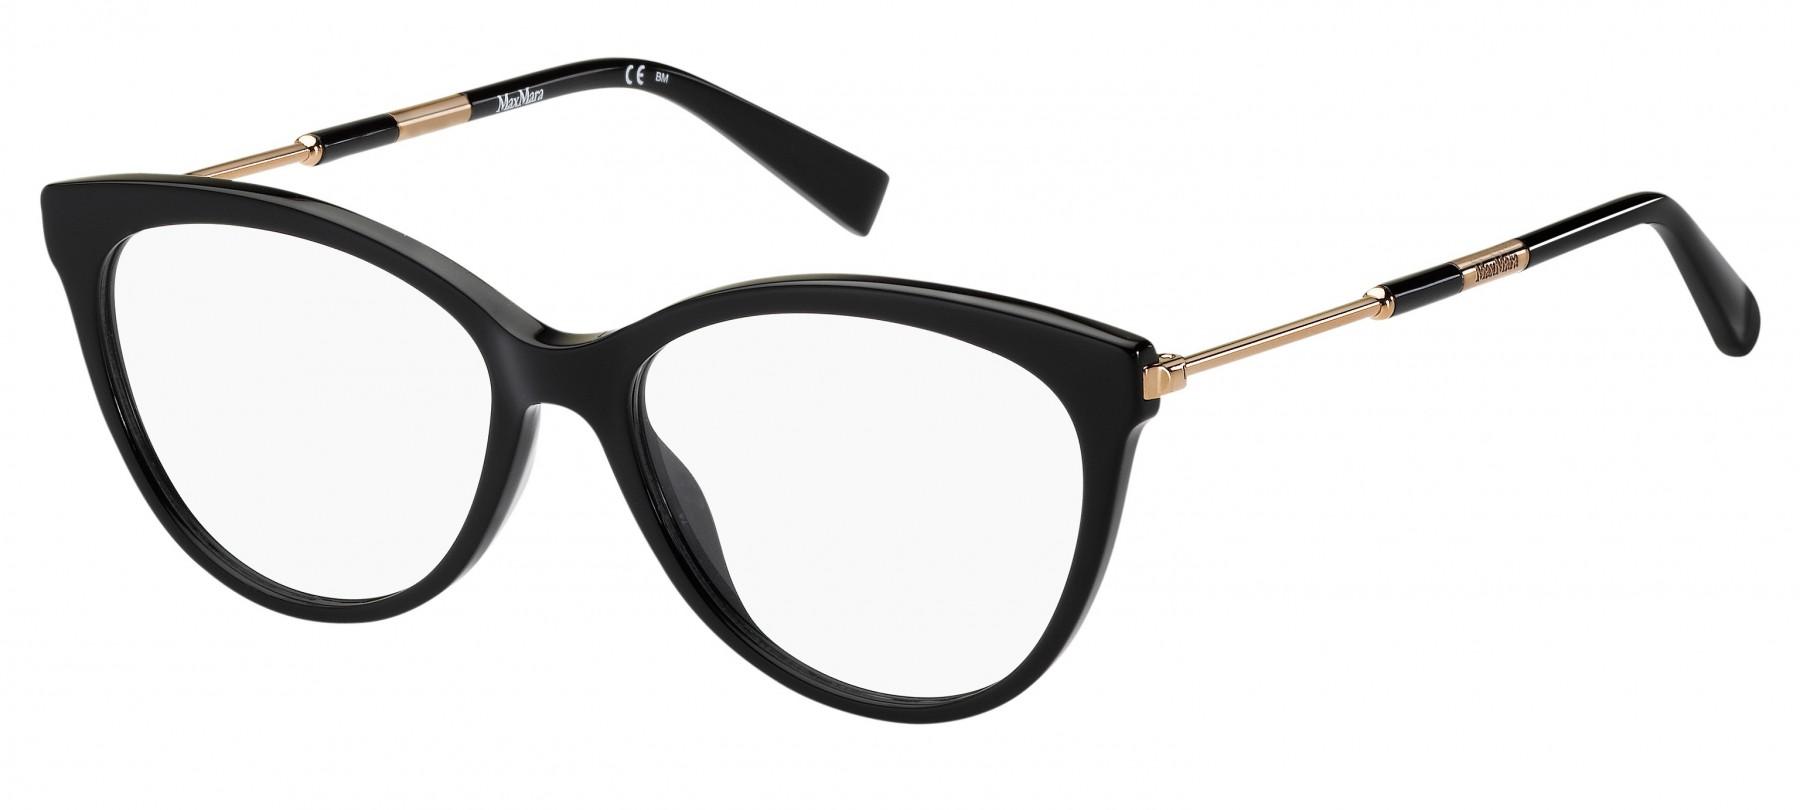 Max Mara 1332 80716 - Oculos de Grau